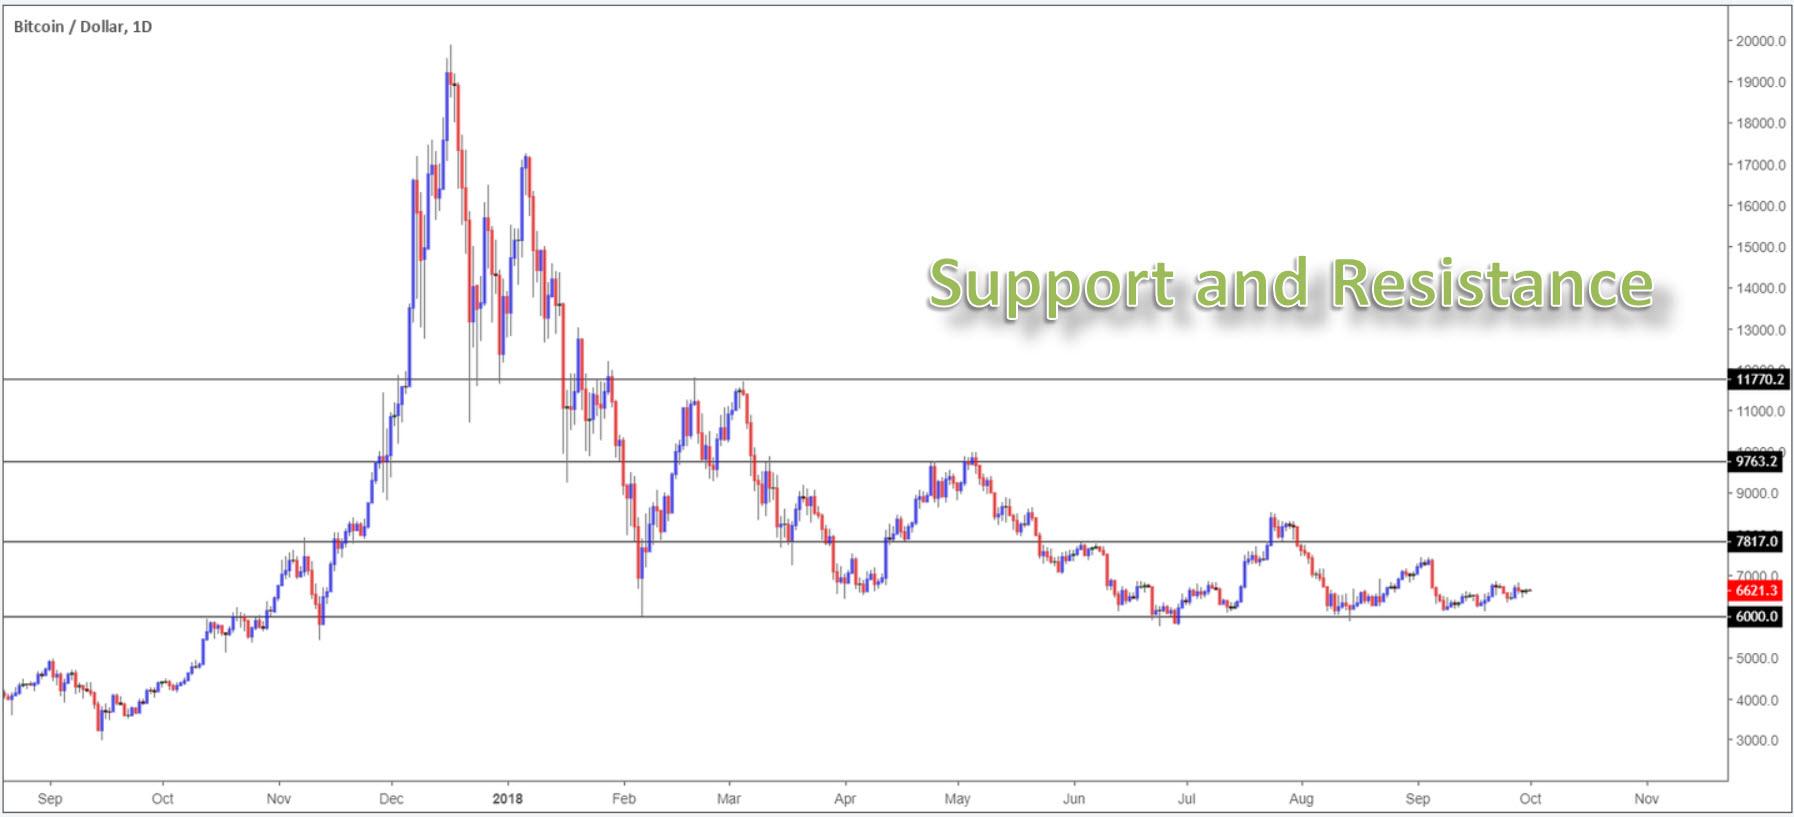 How to trade bitcoin 2